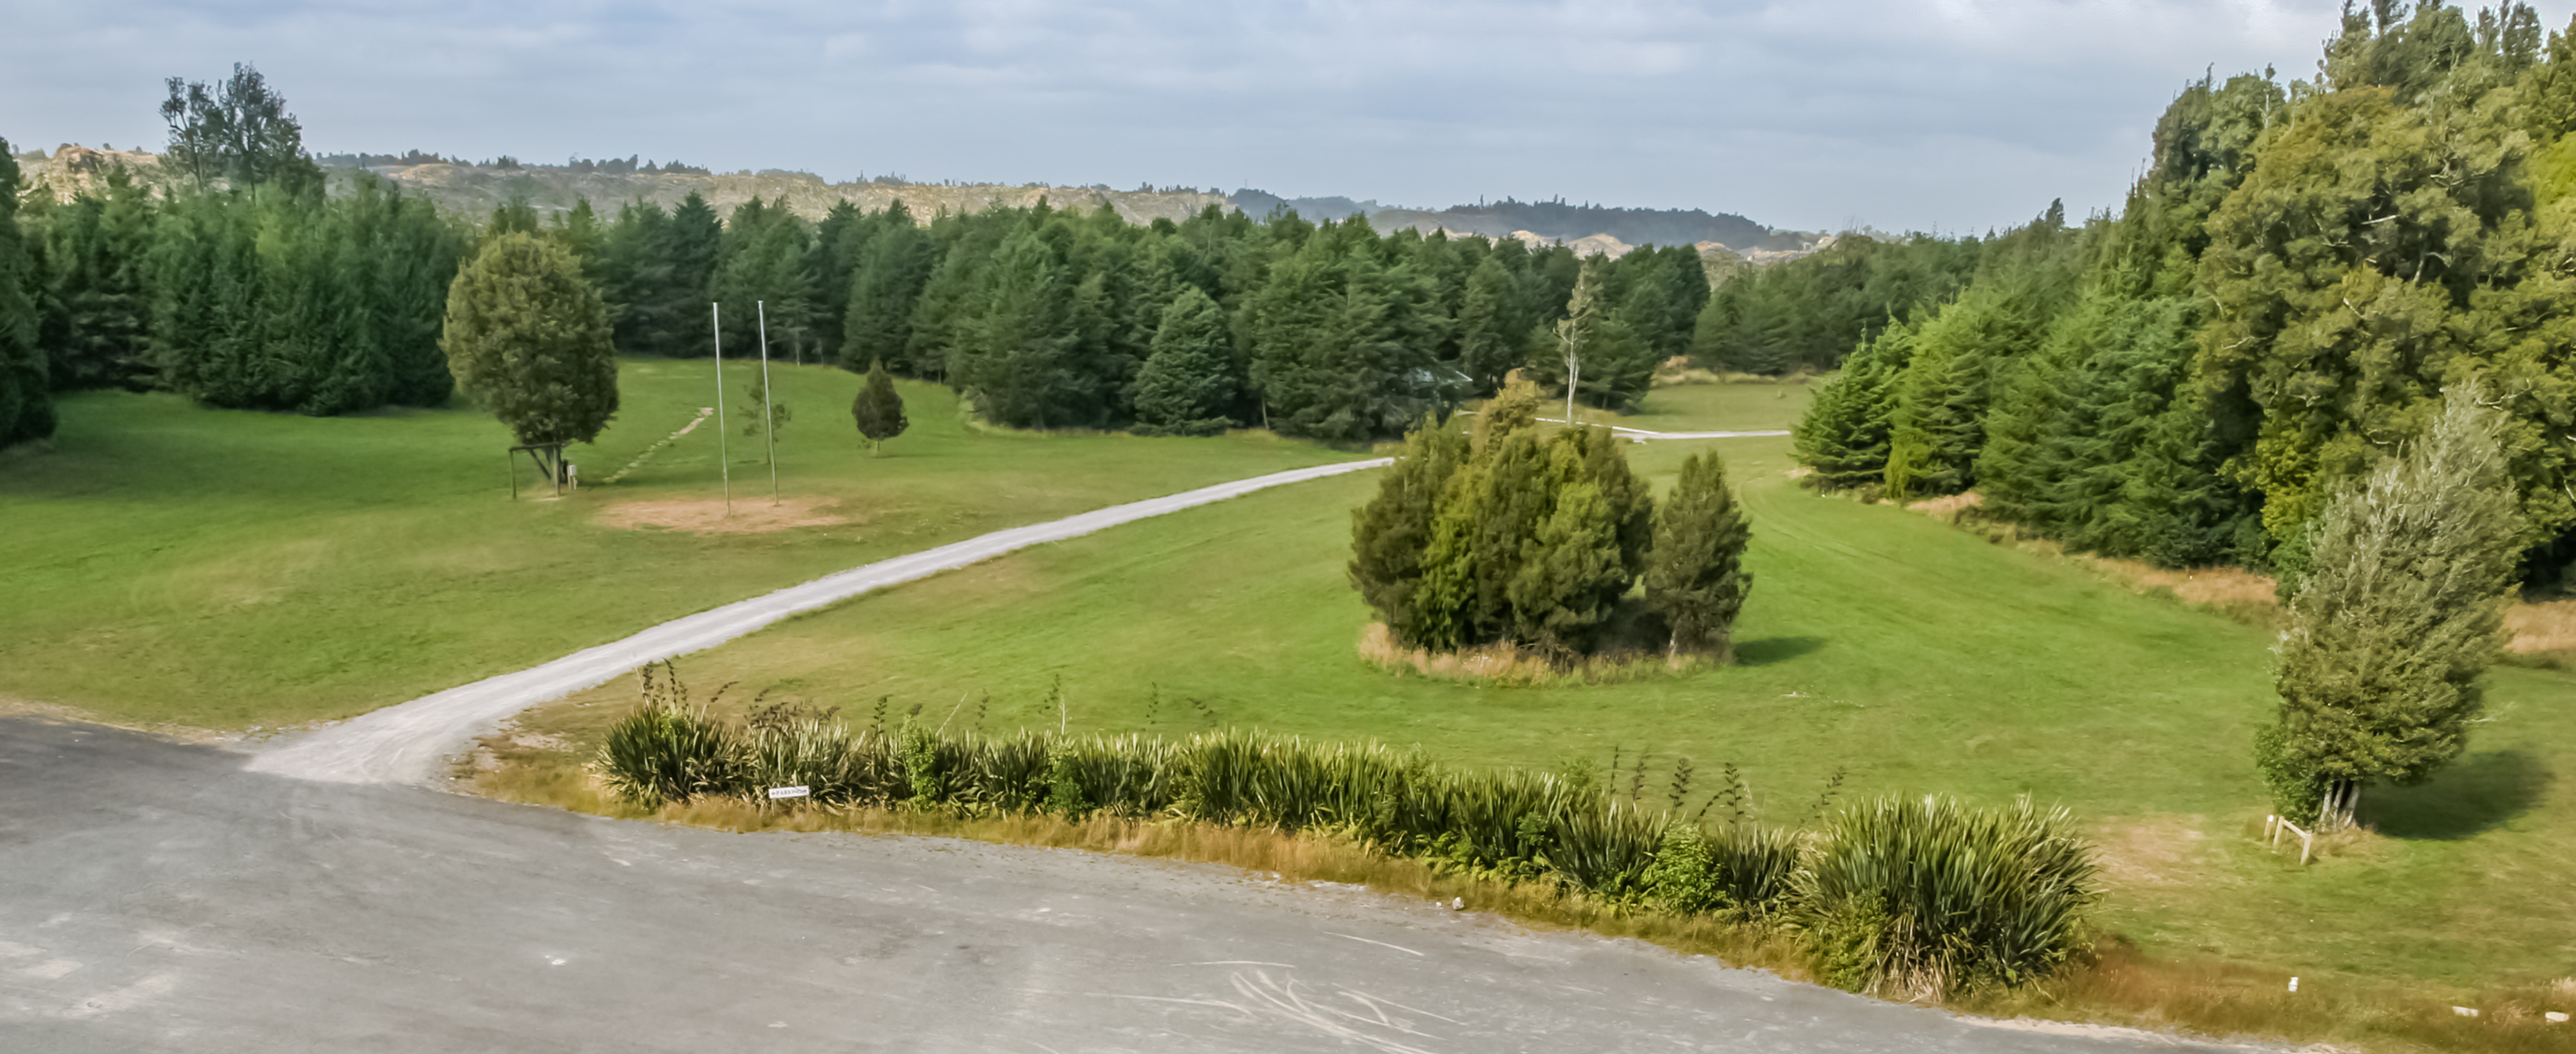 Tui Ridge Park Grounds